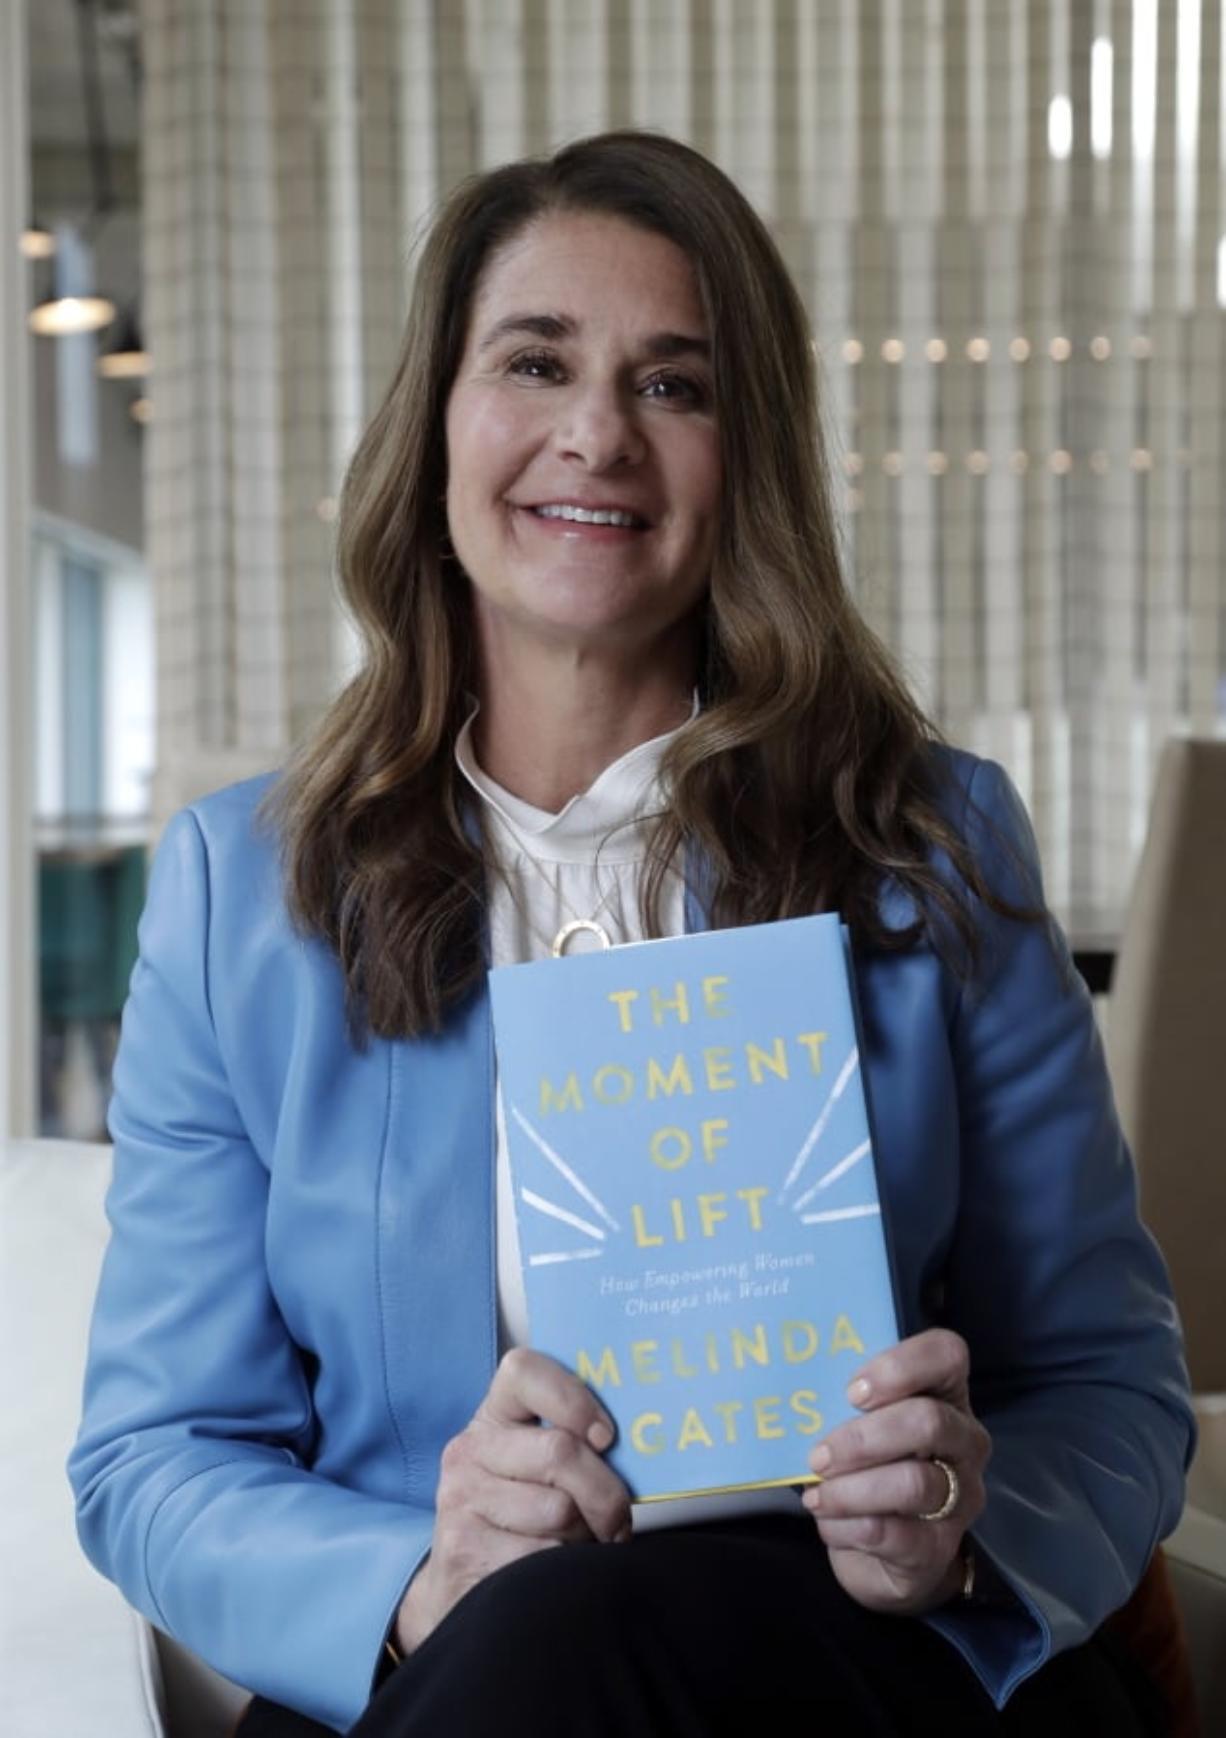 Melinda Gates talks 'brash' Microsoft culture in new book - The Columbian